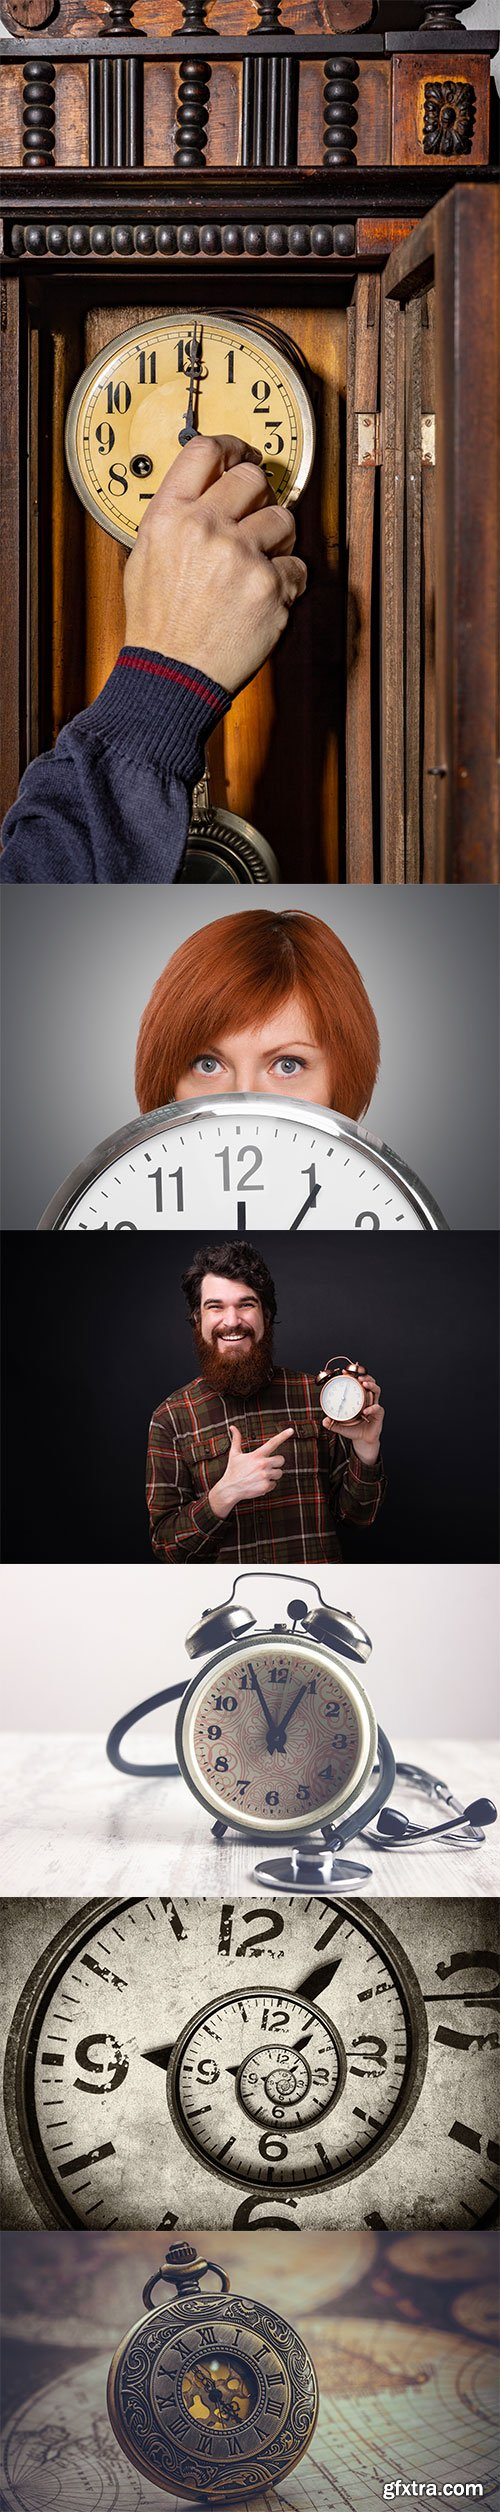 Photo - Clock - 14xJPGs